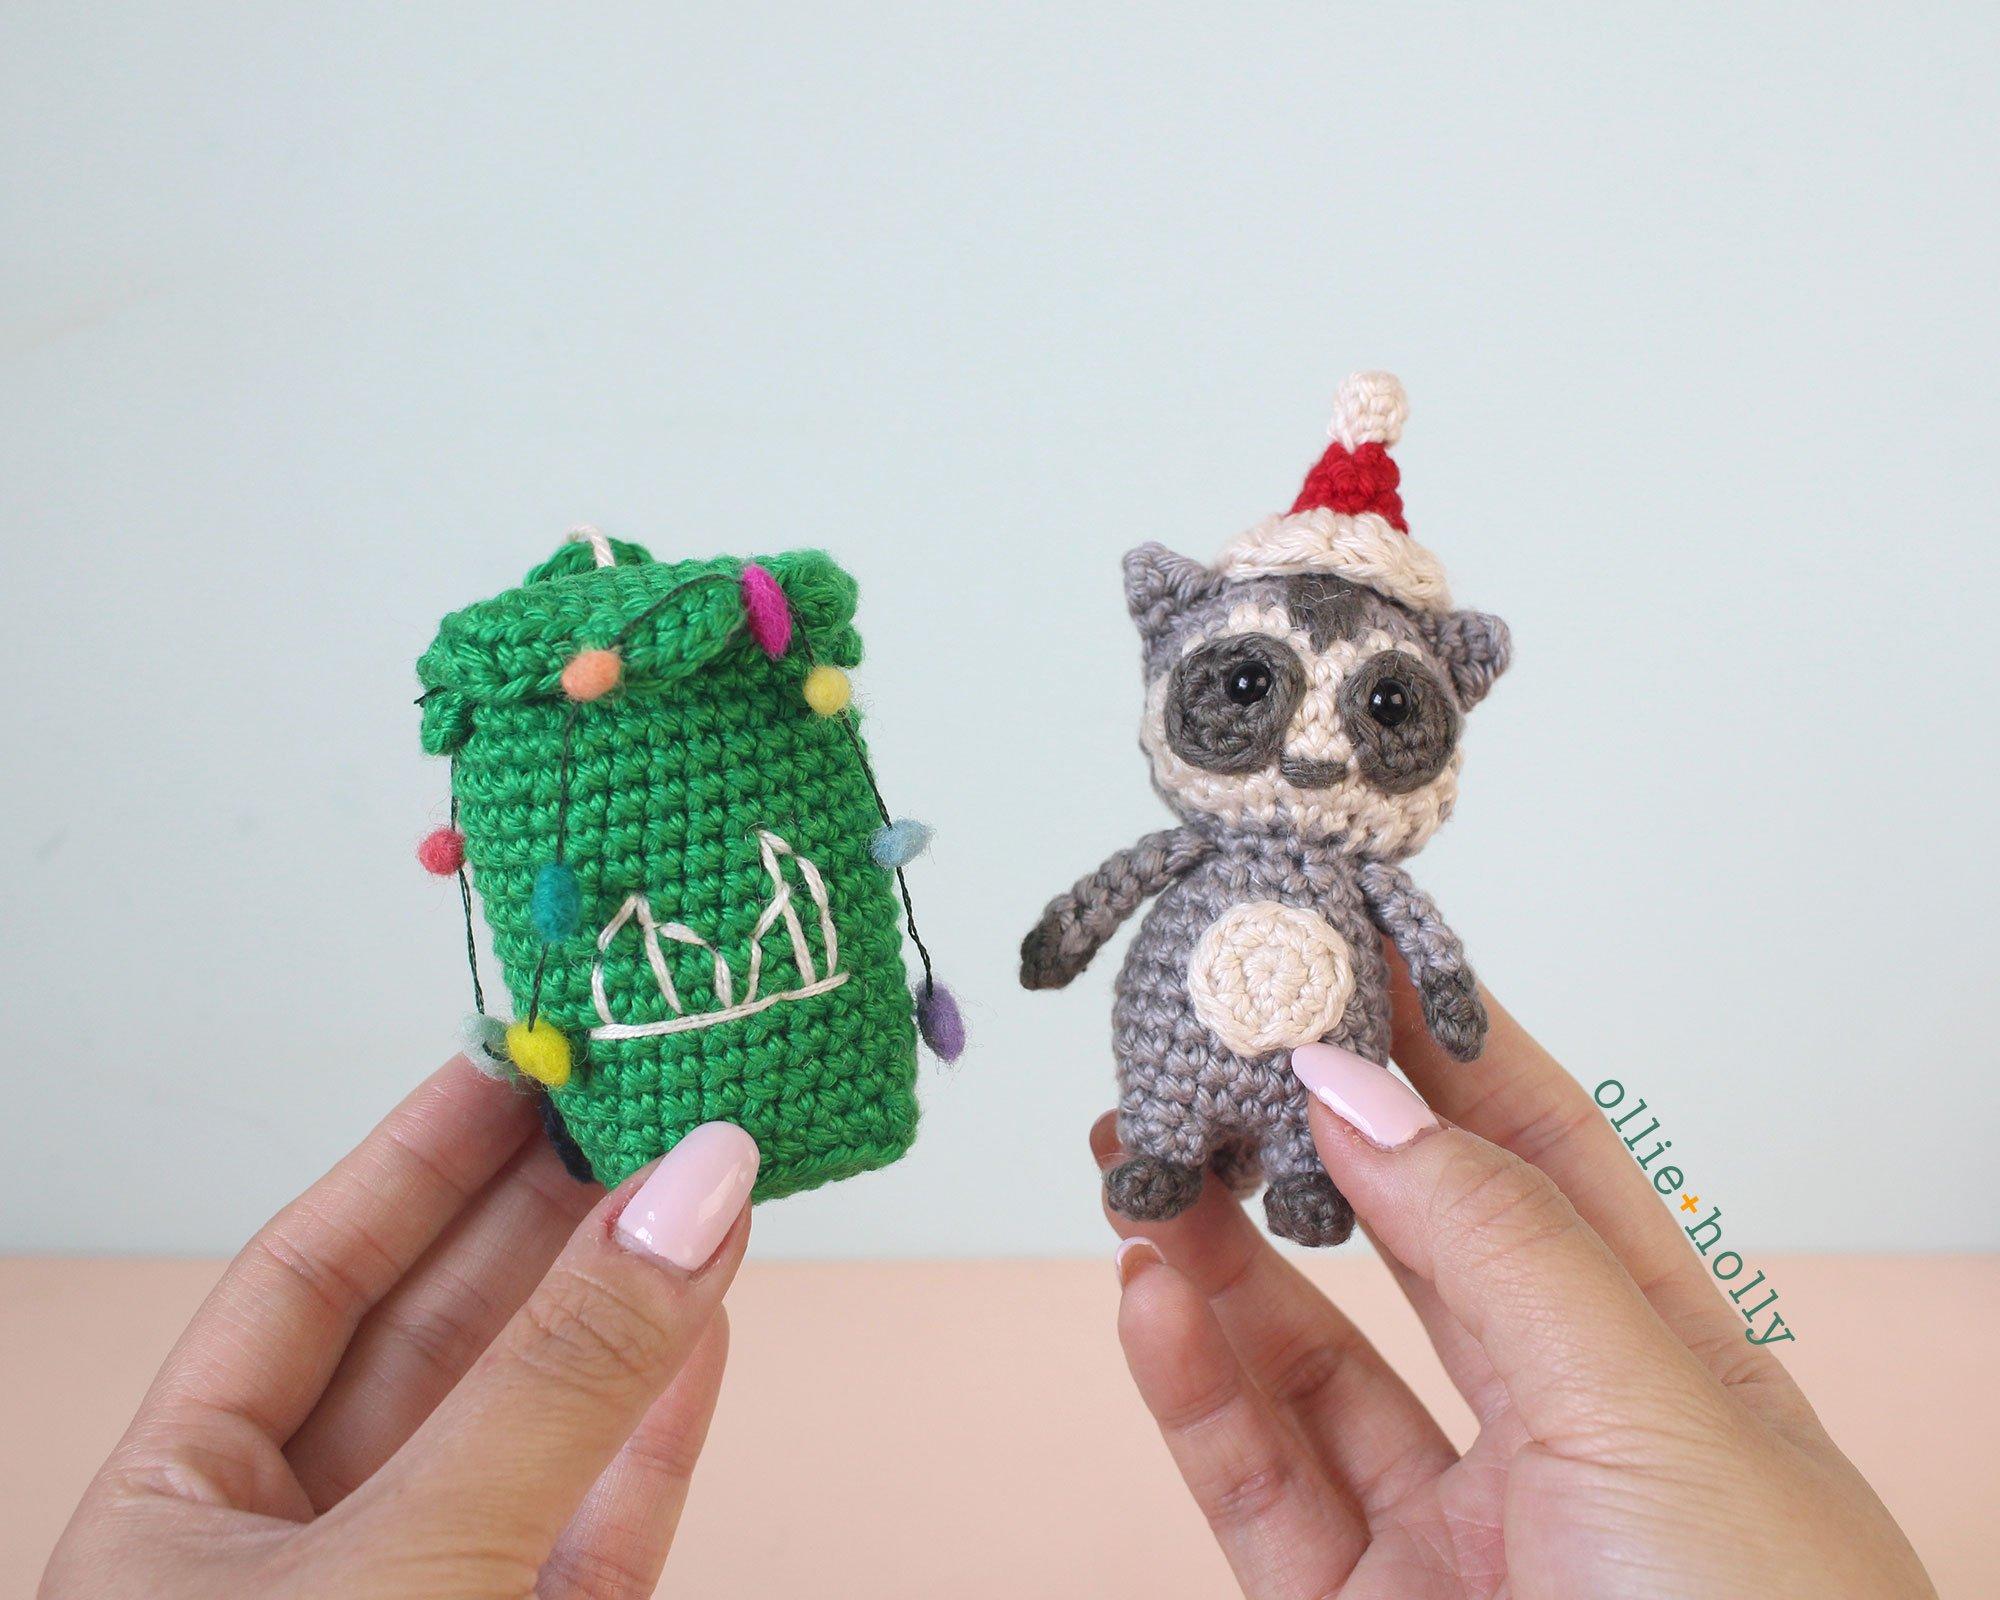 Christmas Holiday Toronto Raccoon and Toronto Garbage Green Bin Amigurumi Crochet Ornament Decoration